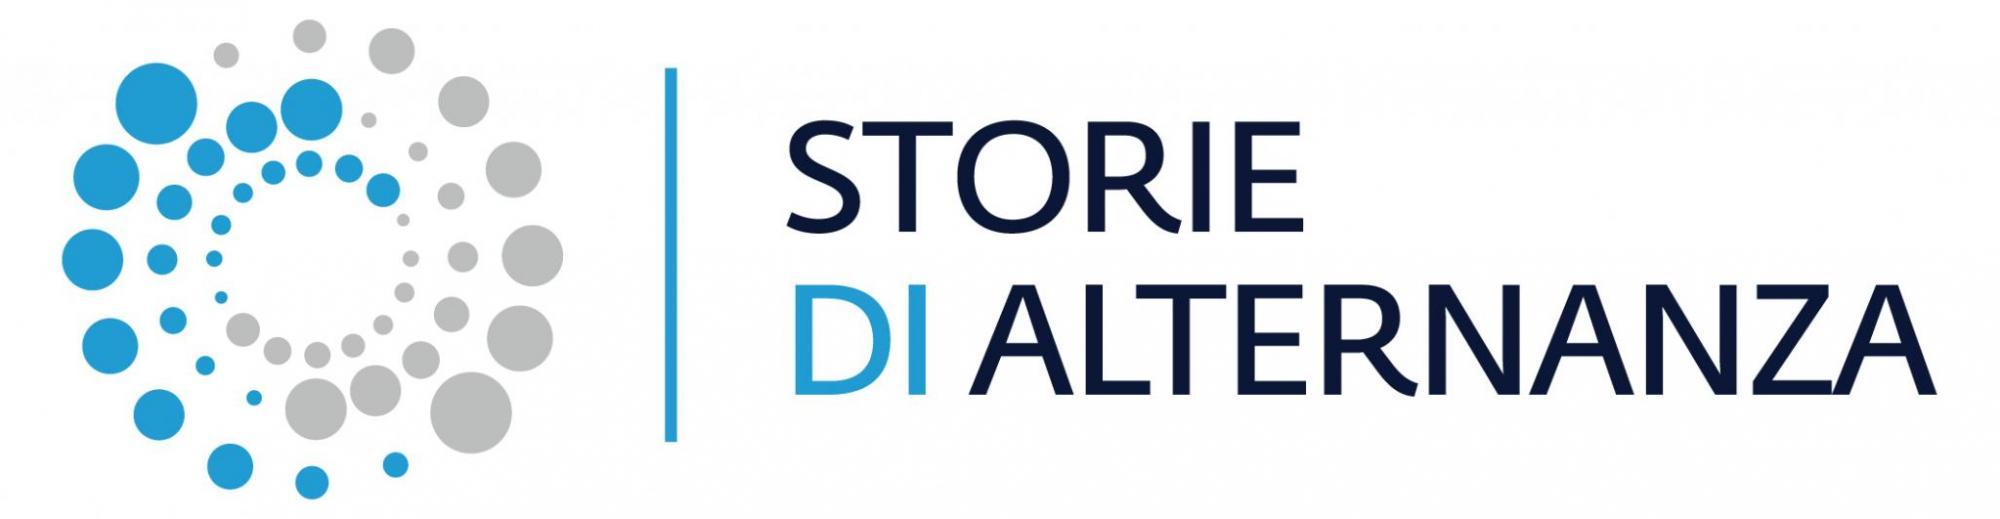 Storie di Alternanza azzurro